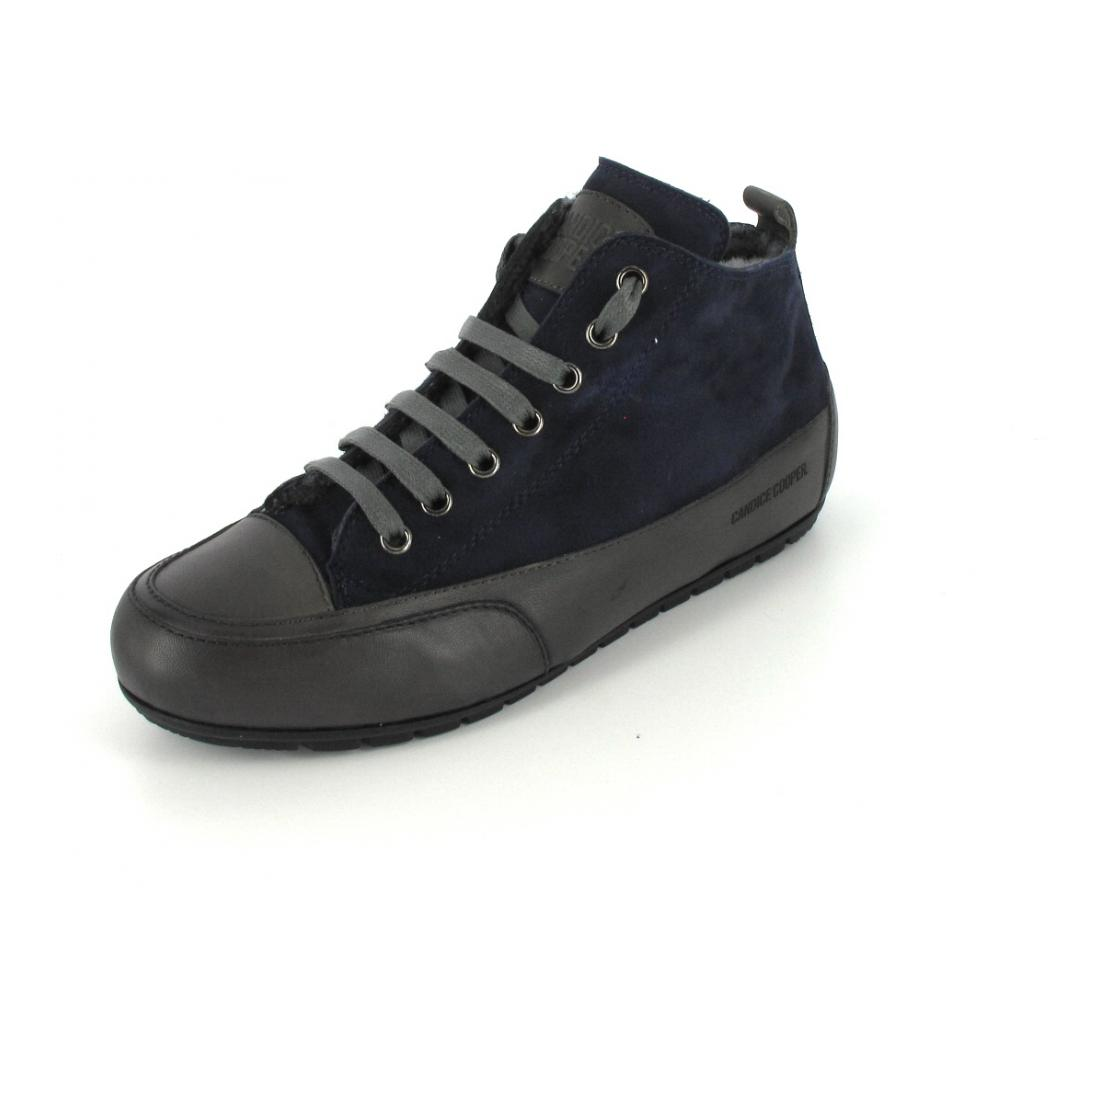 Candice Cooper Sneaker high Antracite